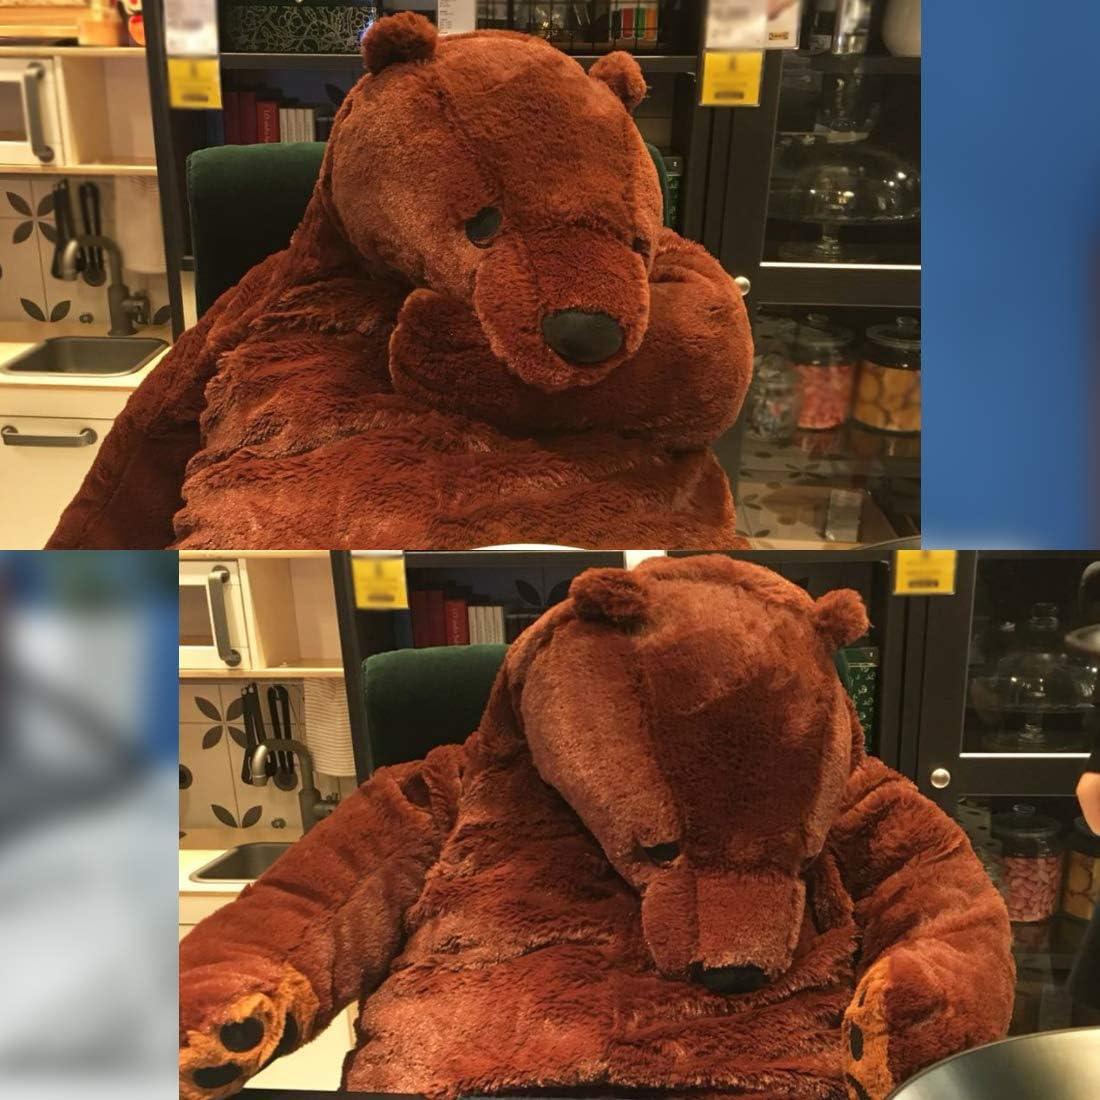 Giant Simulation Bear Toy Plush Toy Pillow Soft Animal Stuffed Plush Doll DJUNGELSKOG Home Decor Birthday Gift 100CM//39.4IN